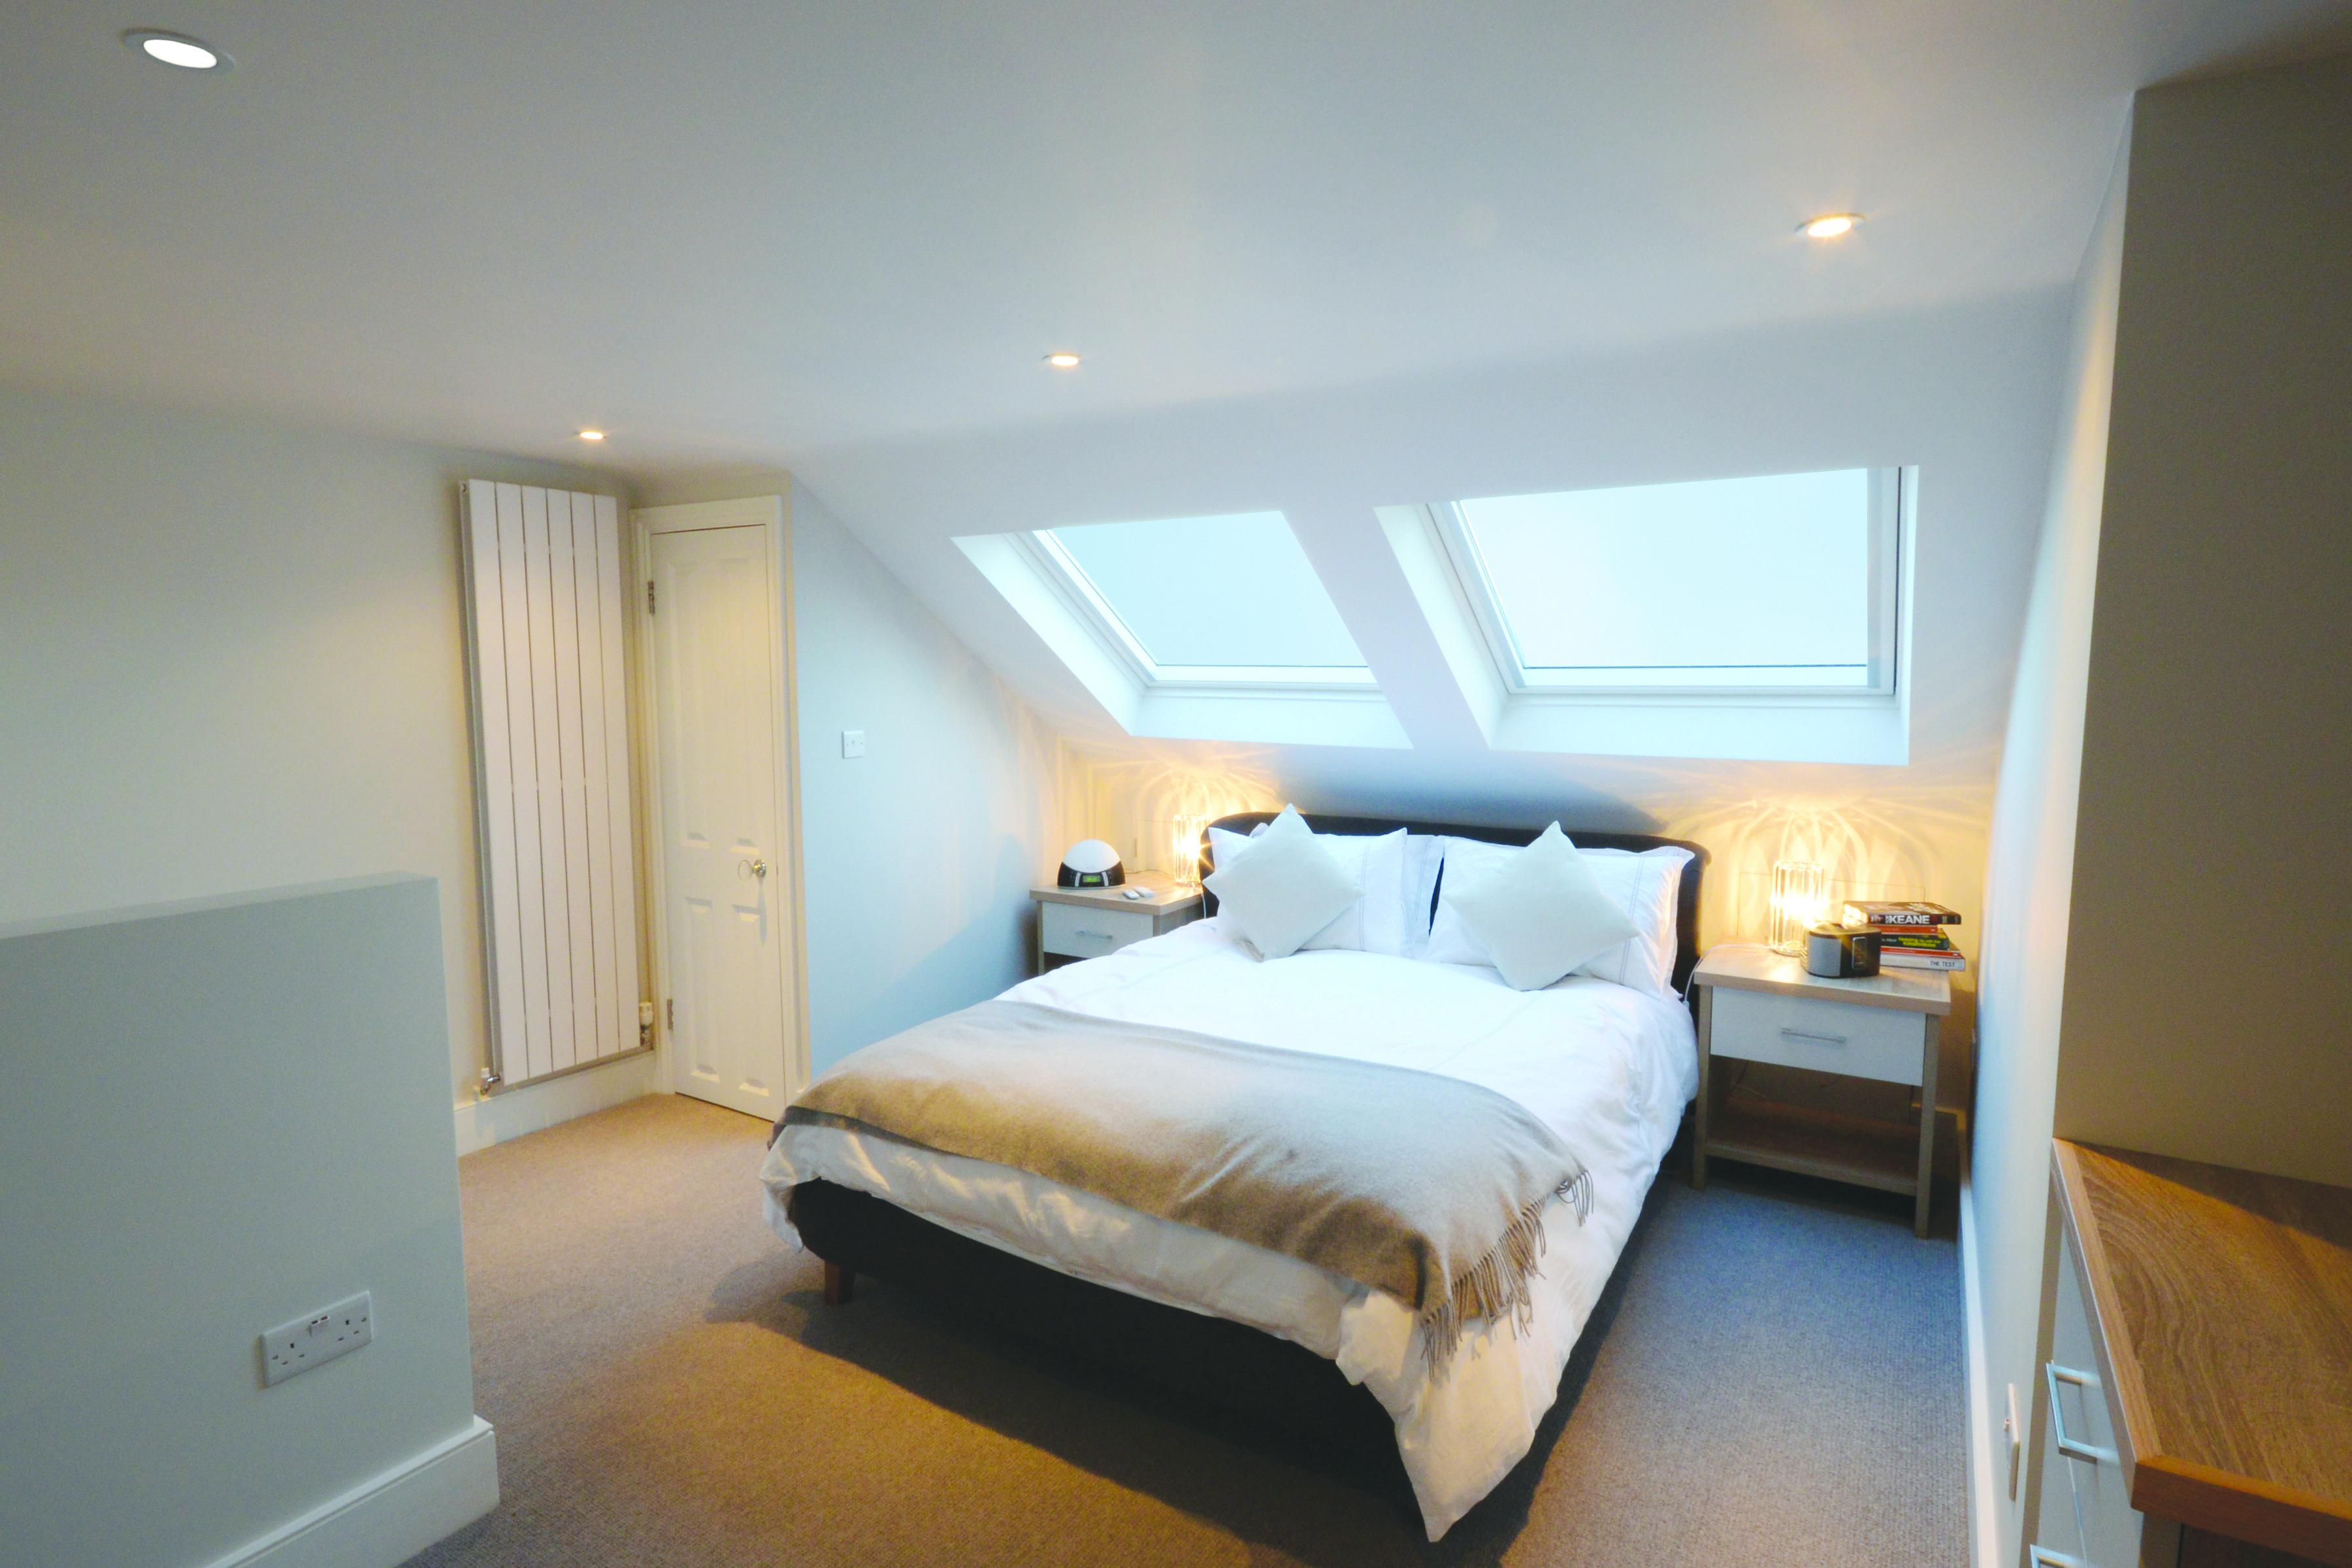 Loft bedroom regulations  Absolute Lofts Ltd absolutelofts on Pinterest